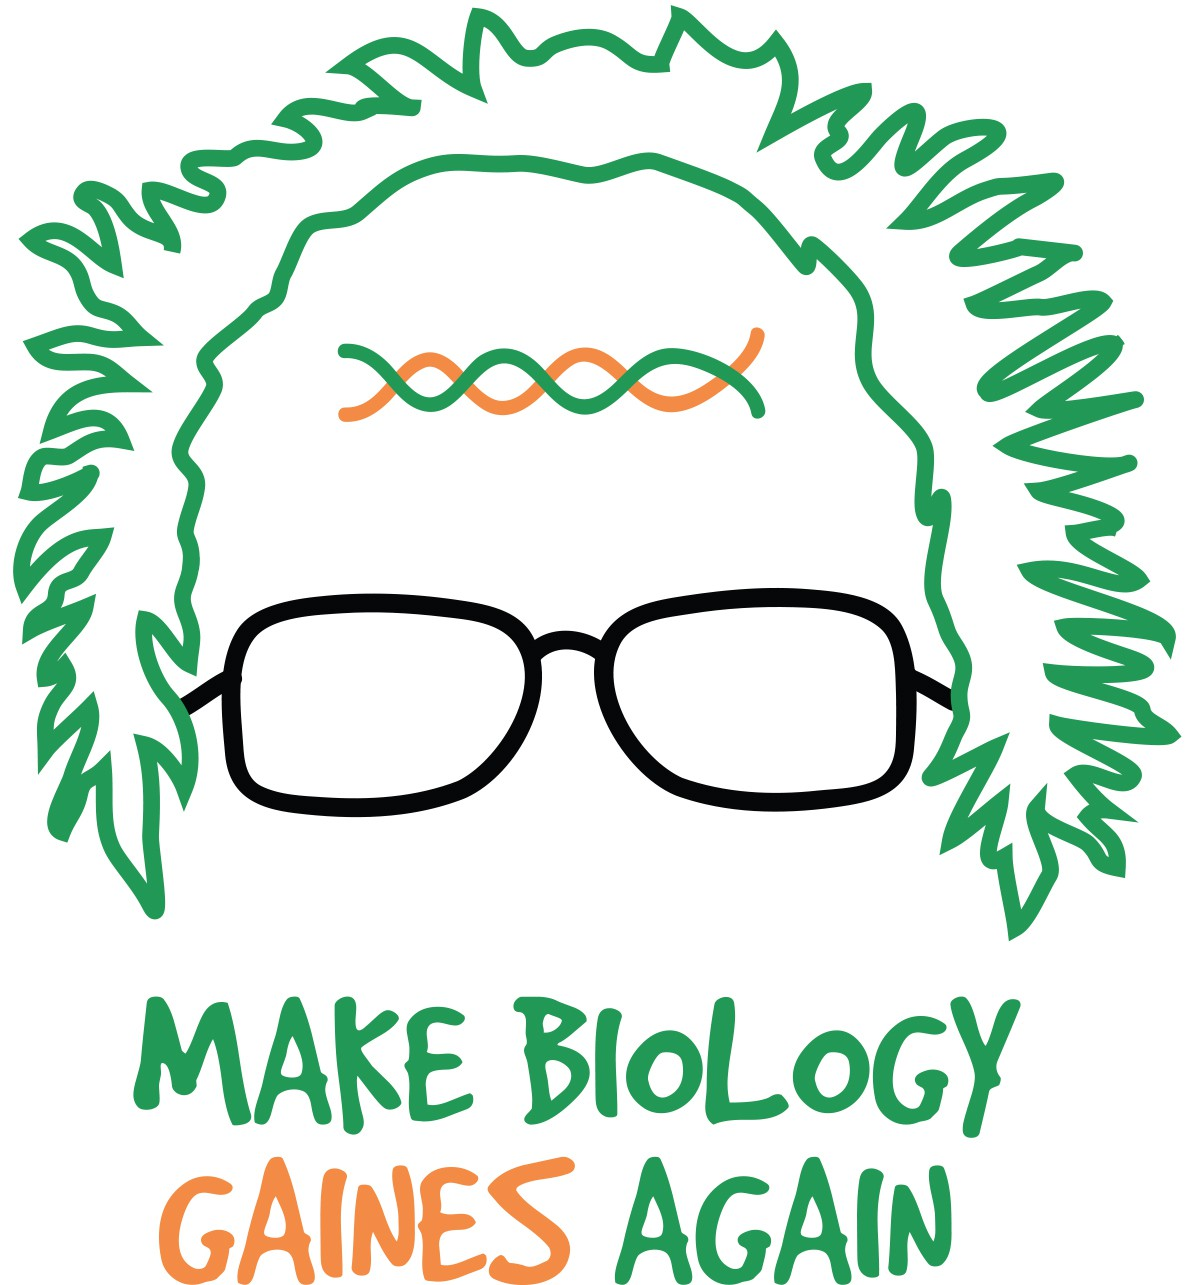 Bring Bernie to Biology